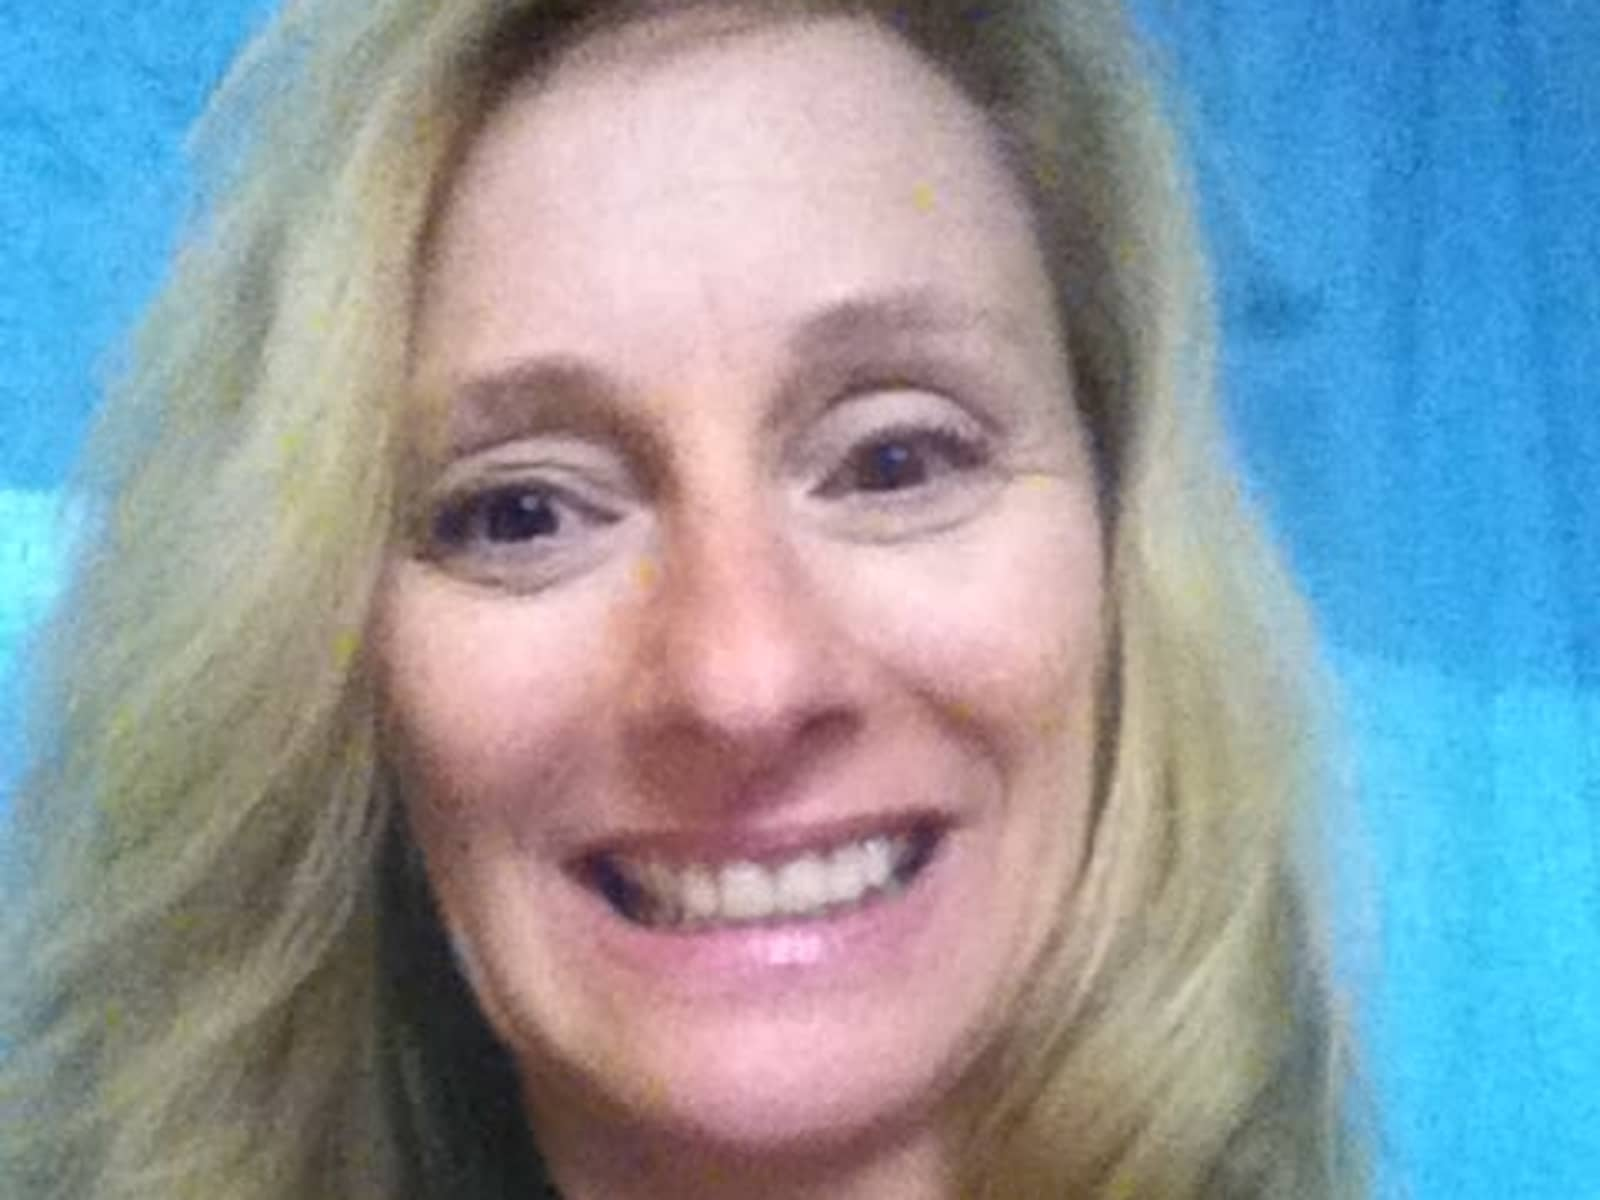 Angela from Charleston, West Virginia, United States